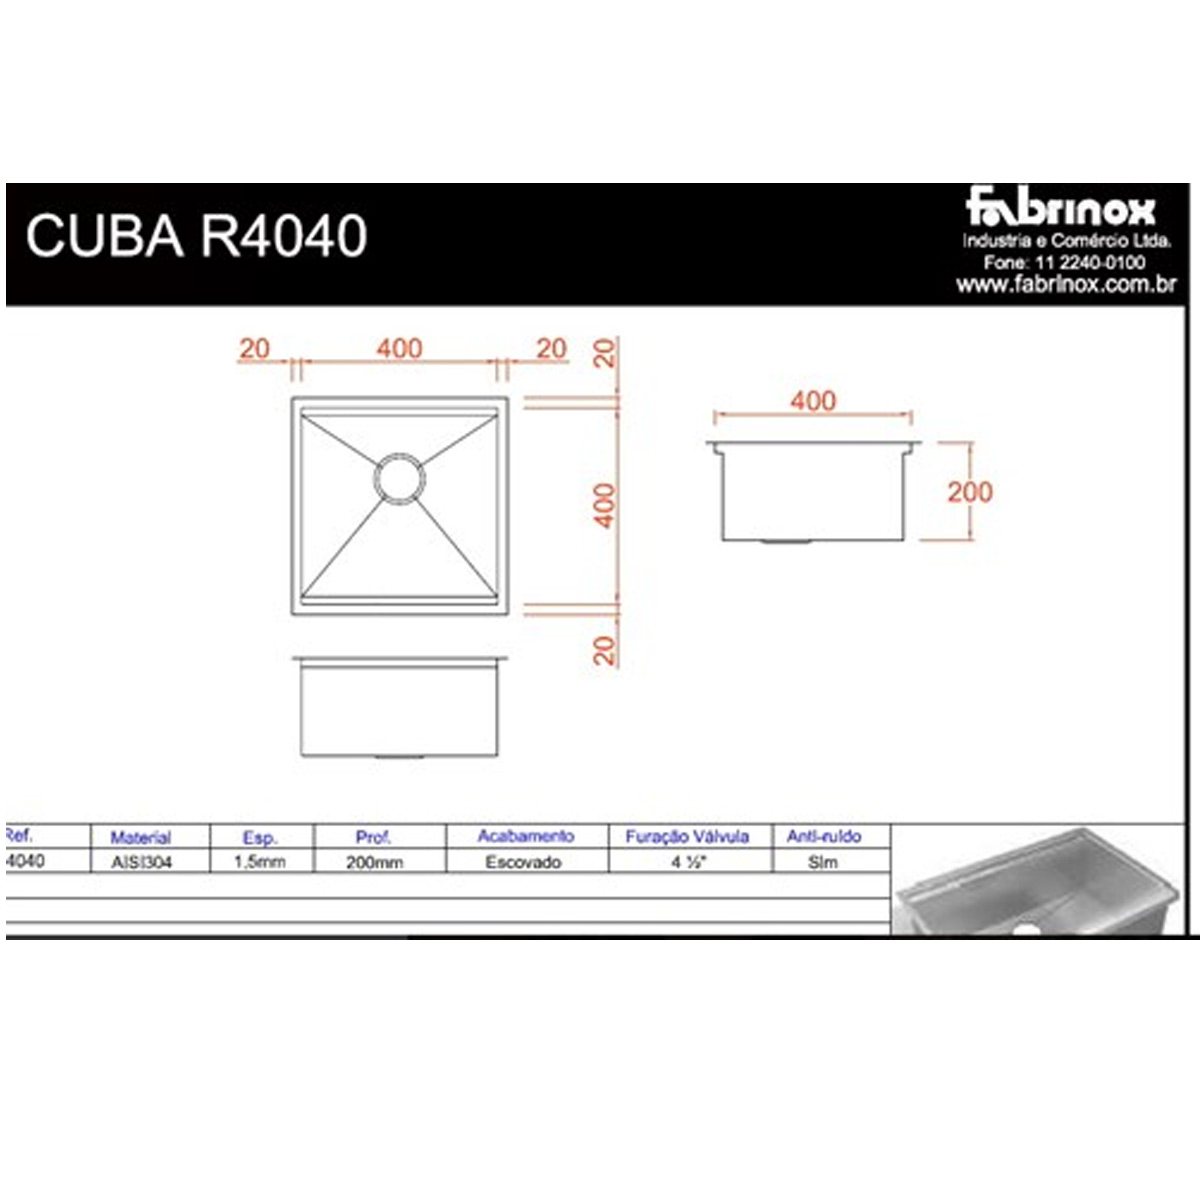 Cuba de Aço inox 304 Quadrato R4040 Fabrinox